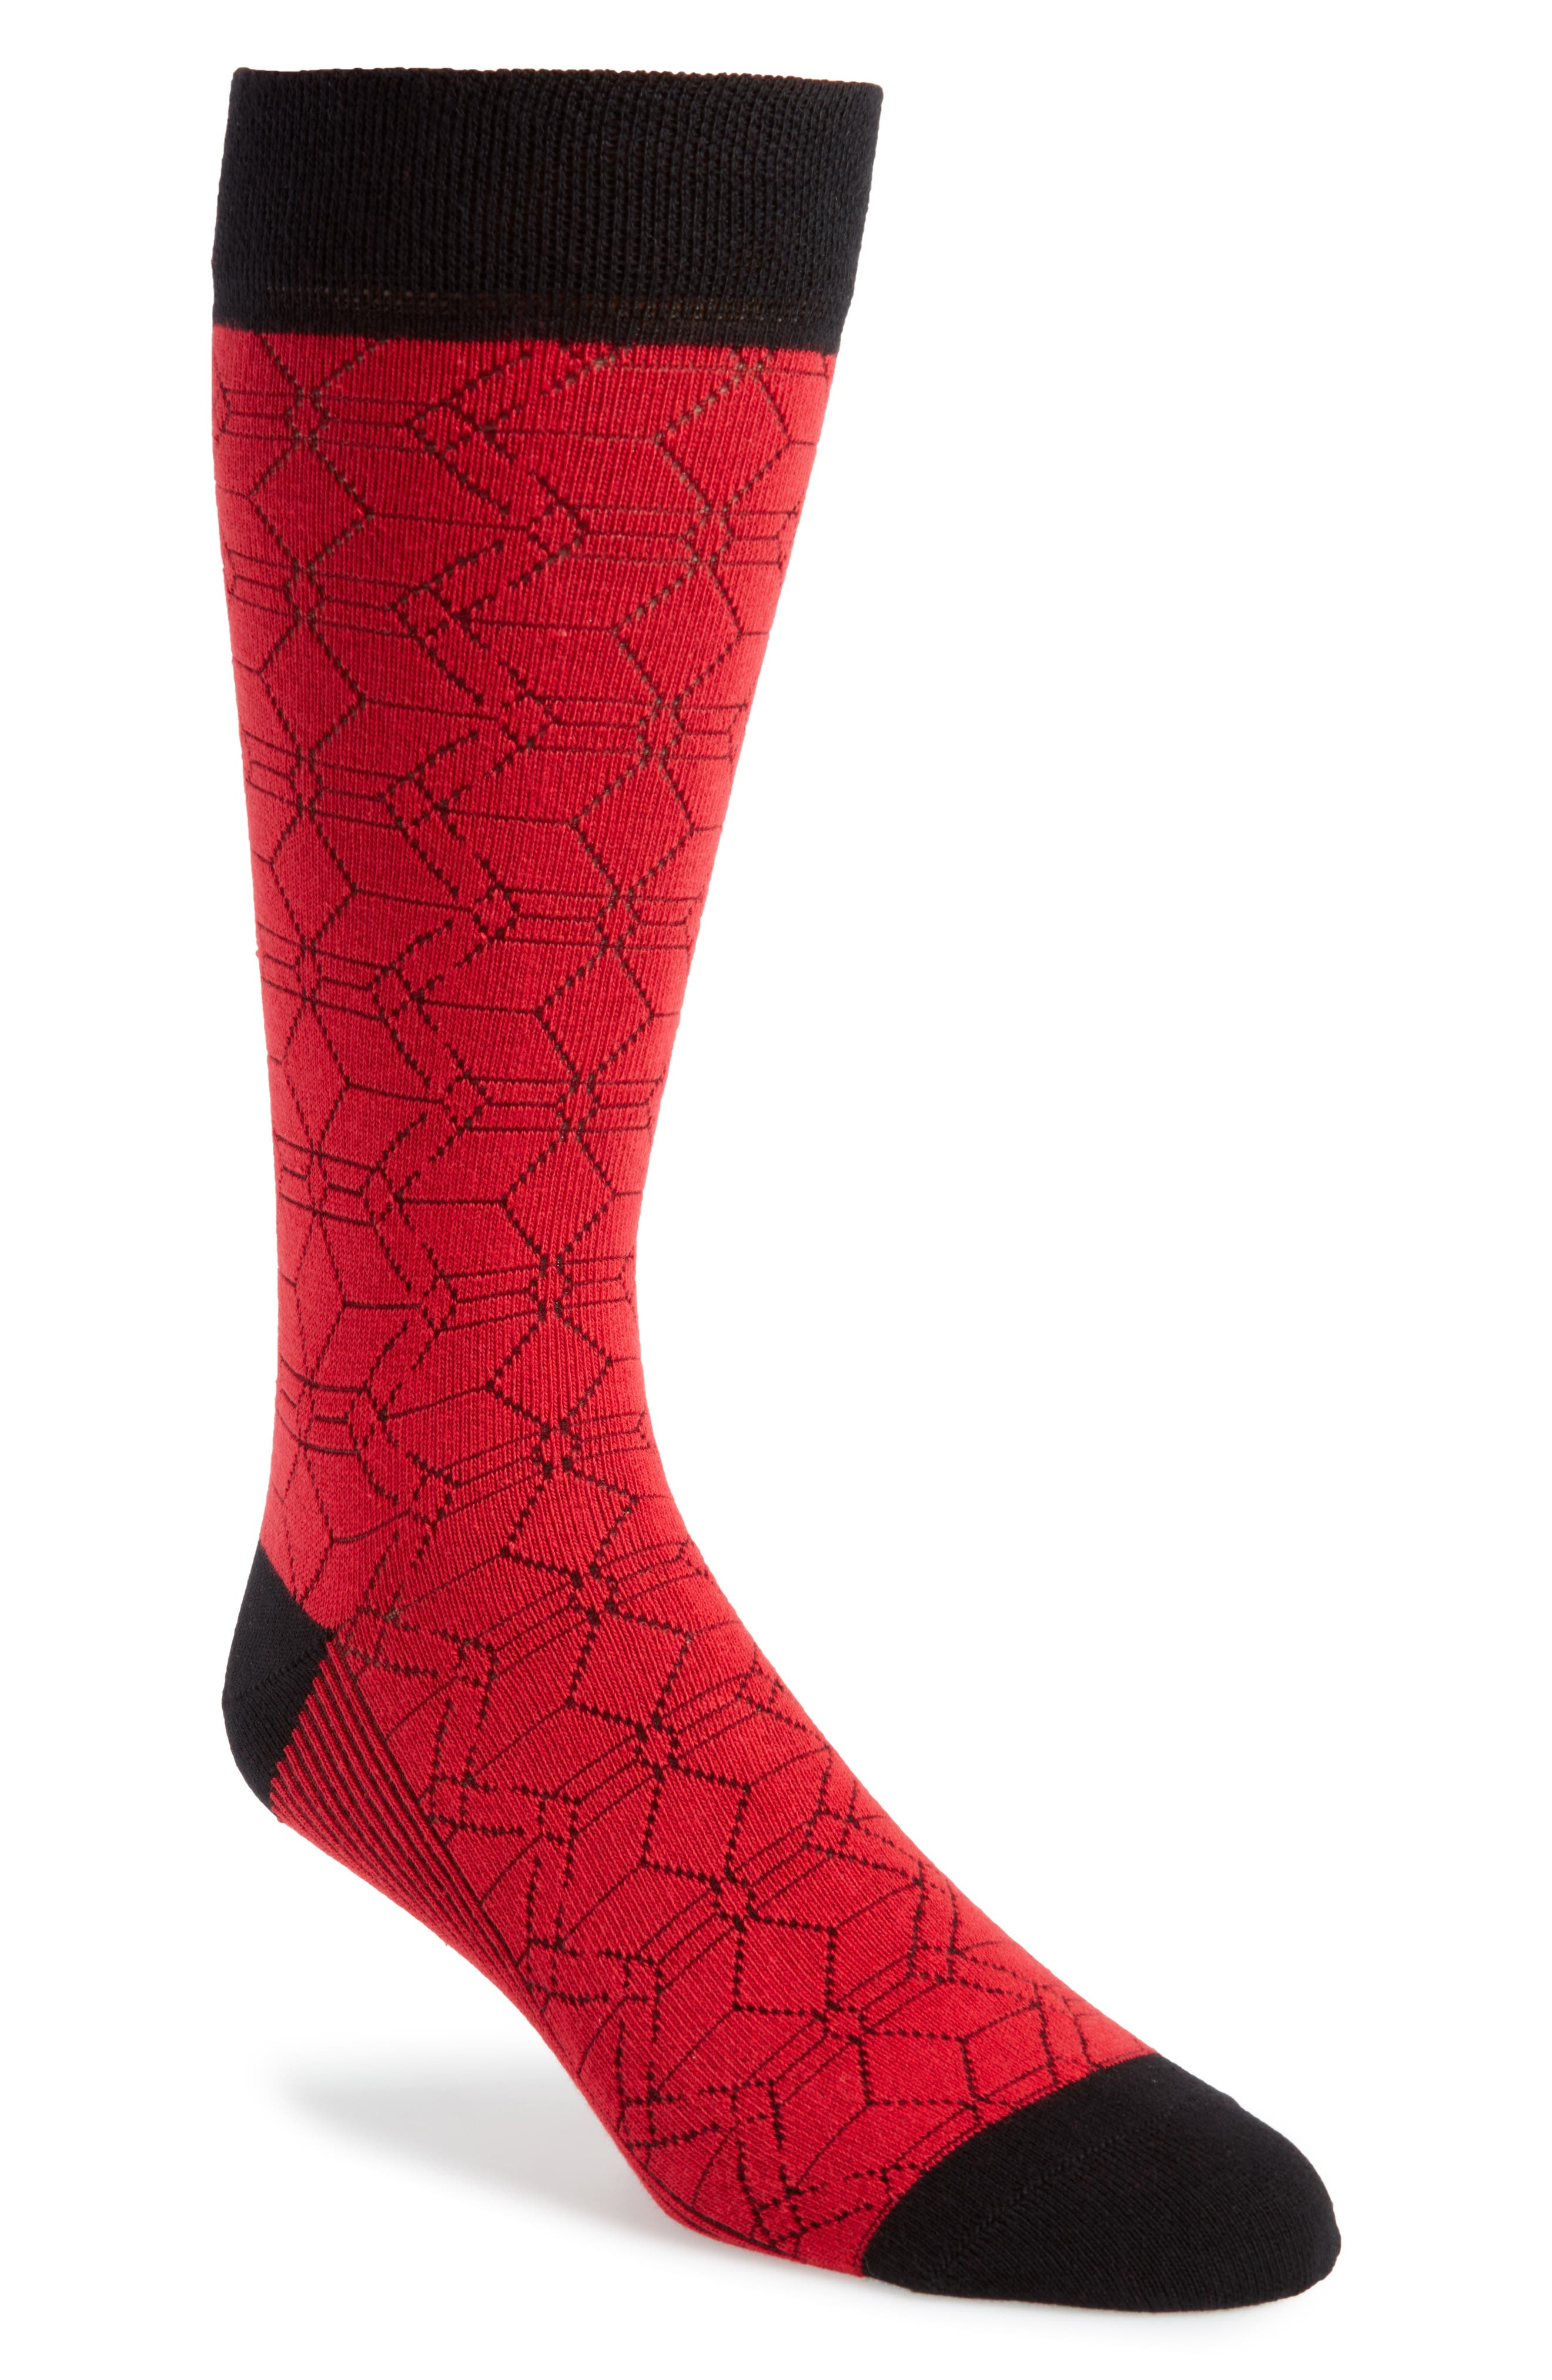 Geo Socks,                         Main,                         color, Red